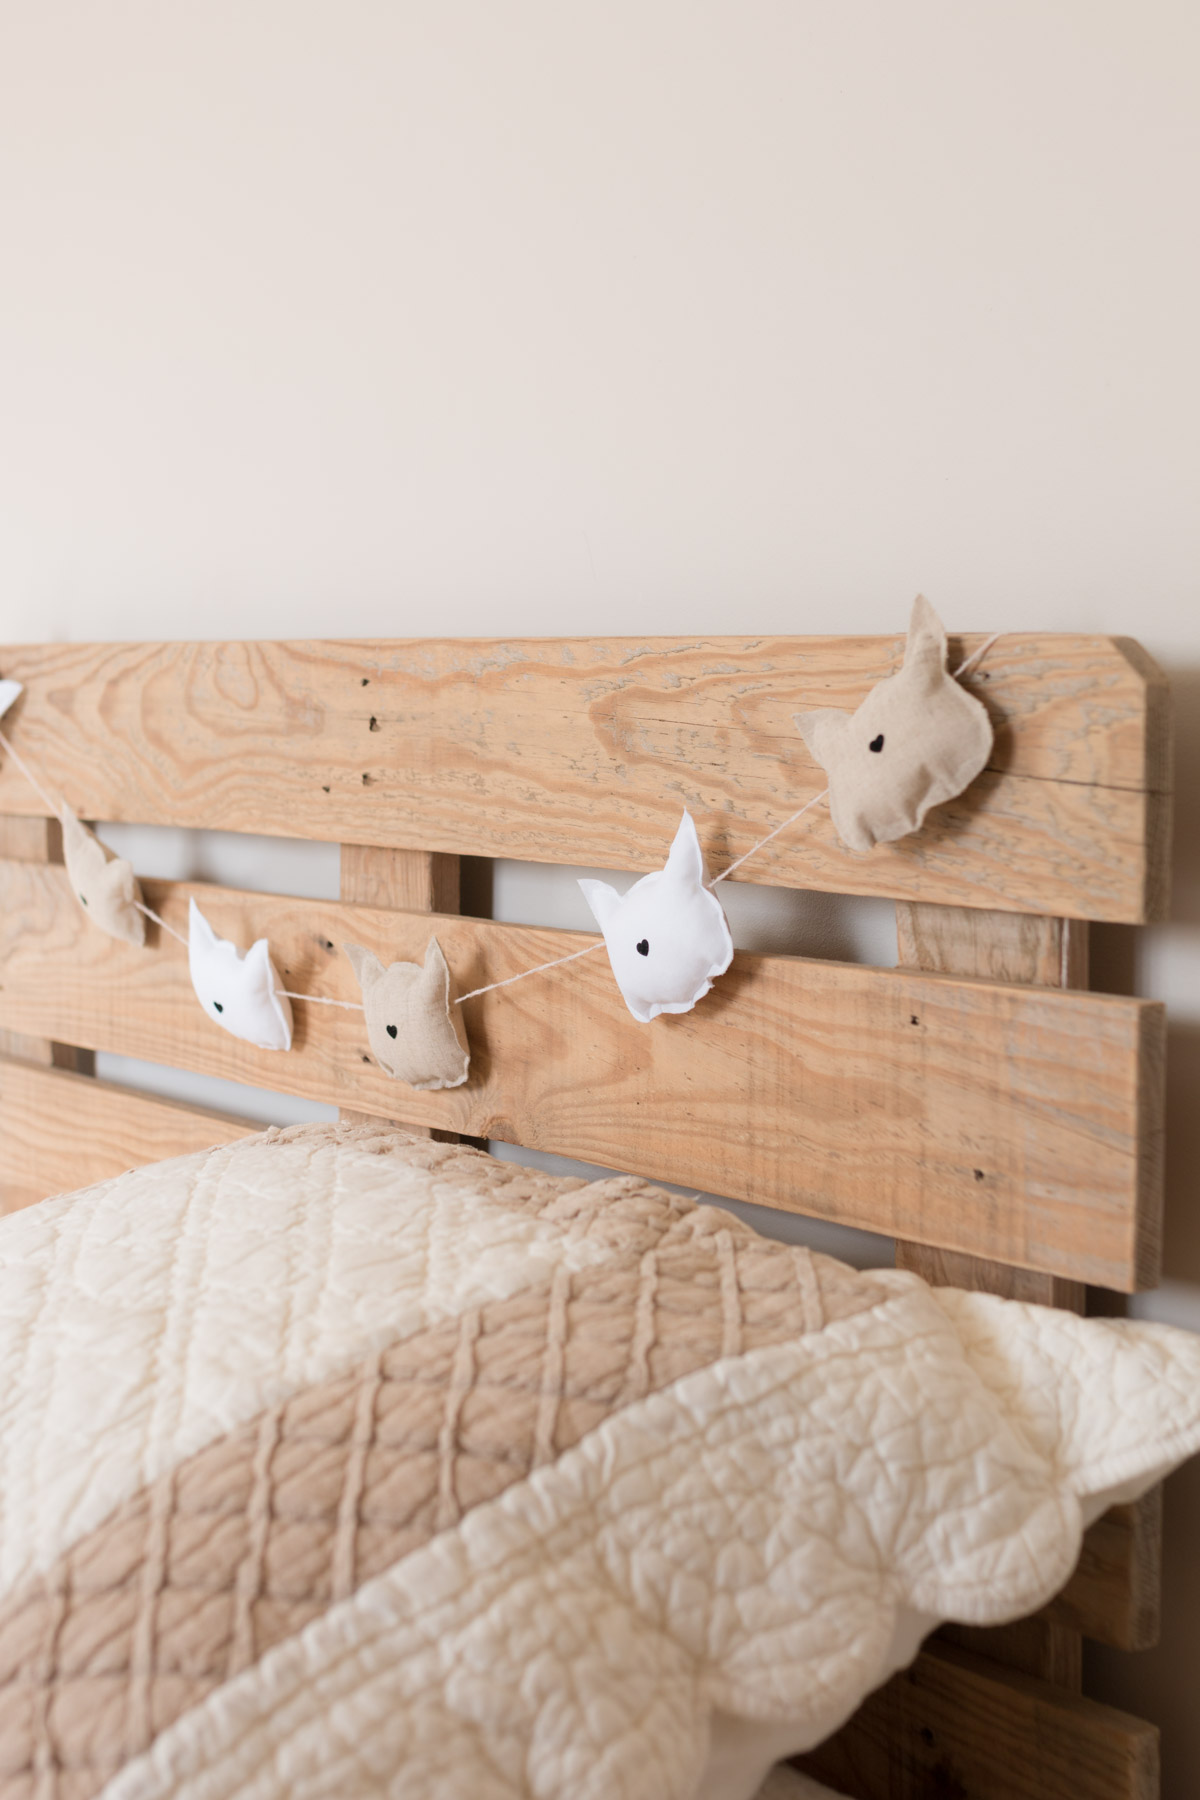 DIY cat garland I Sp4nkblog-15